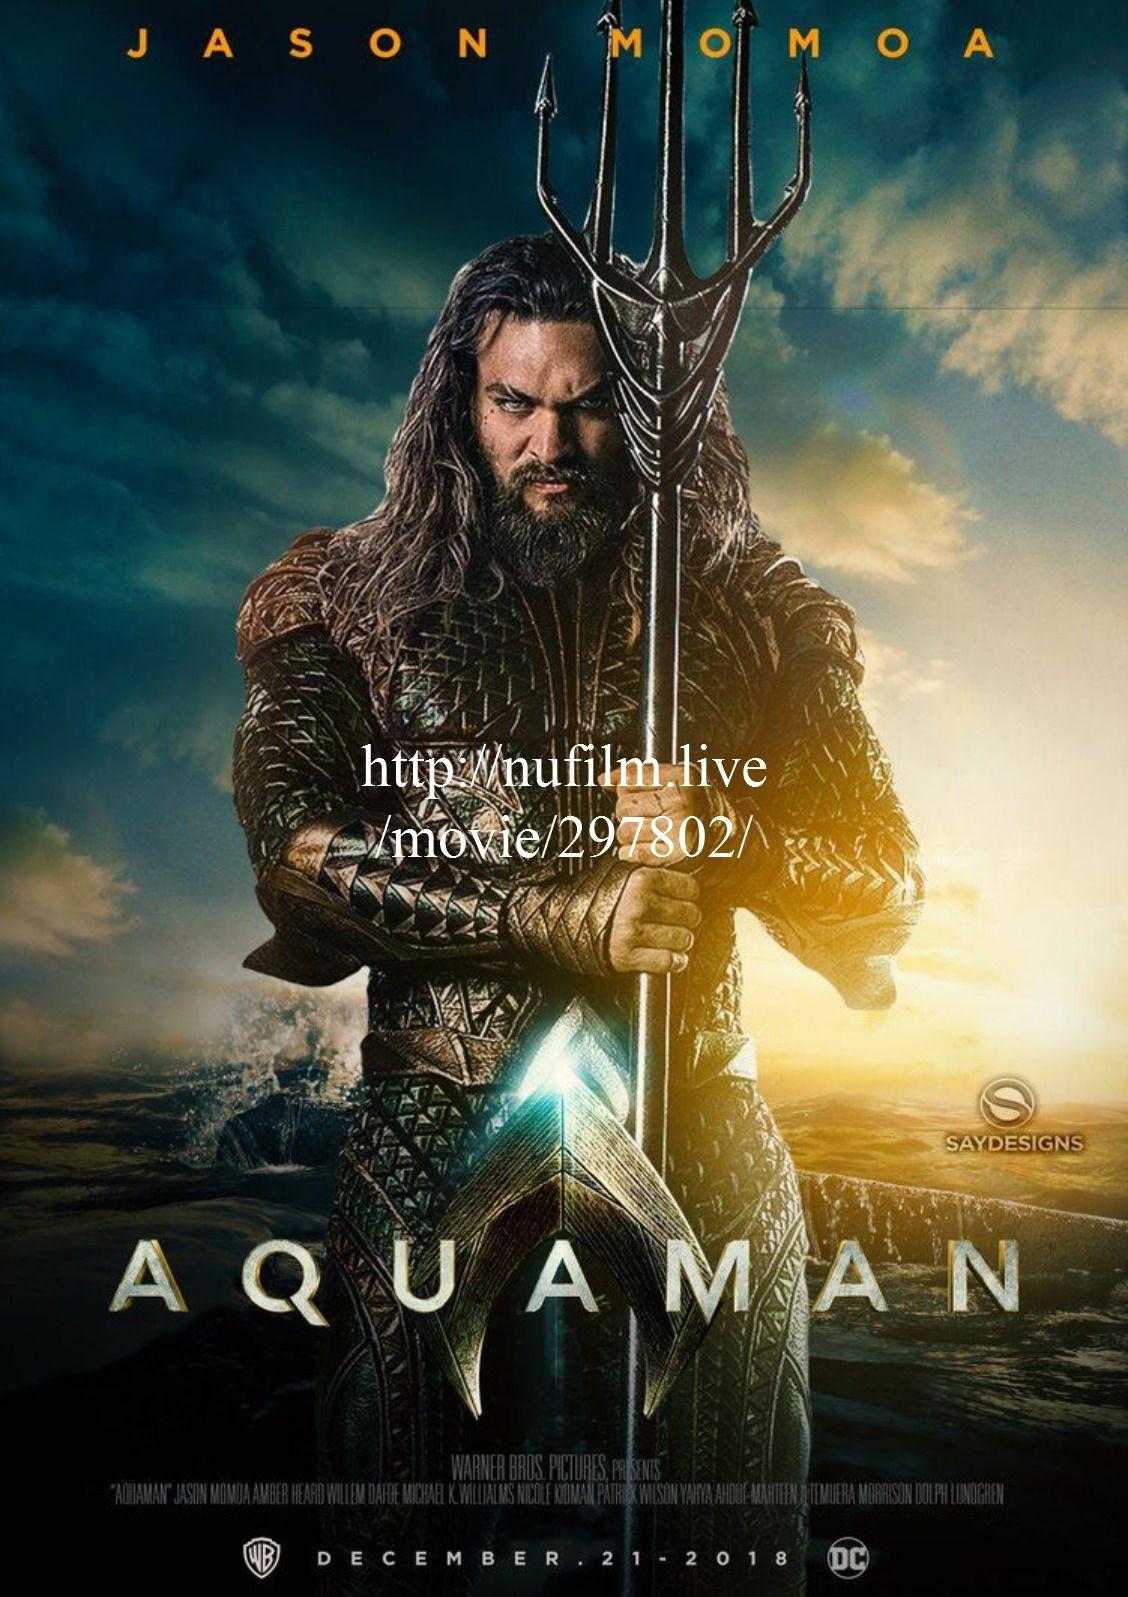 Regarder Venise N Est Pas En Italie 2019 Streaming Vf Complet Entier F Apne Movie Teaser S Pic Aquaman